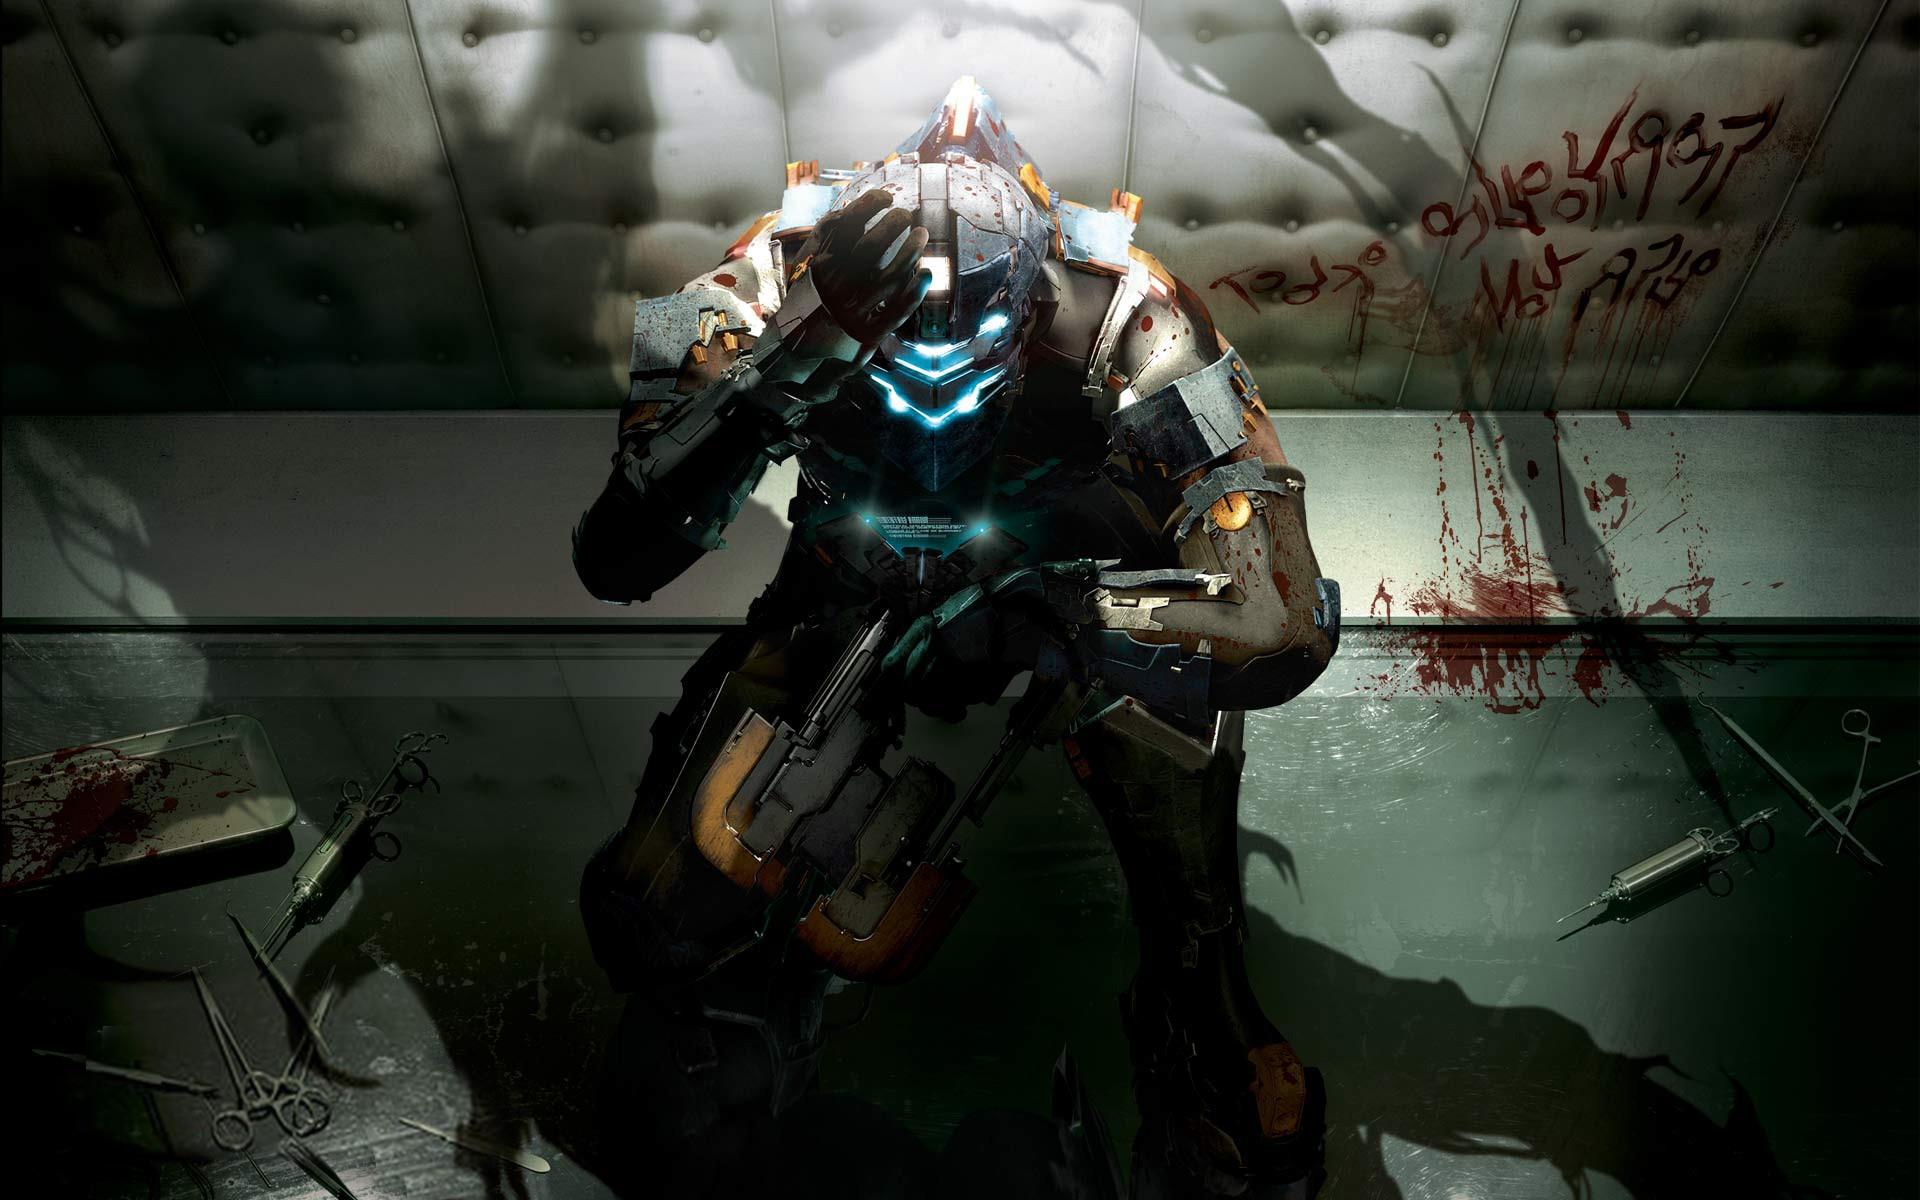 Wallpaper Video Games Anime Blood Machine Comics Dead Space